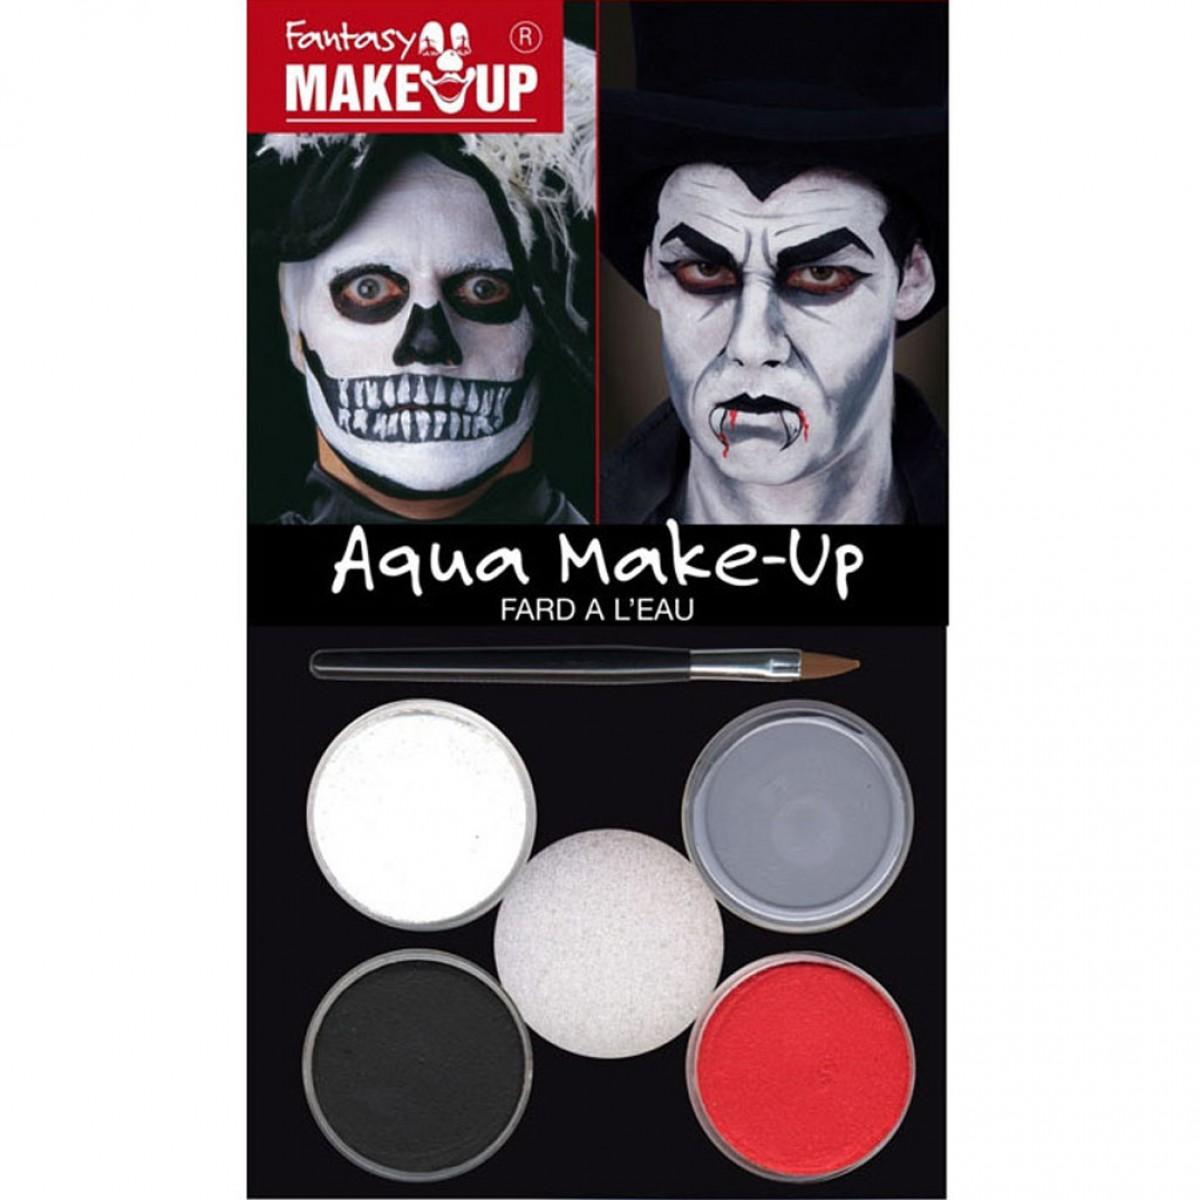 maquillage halloween ou acheter